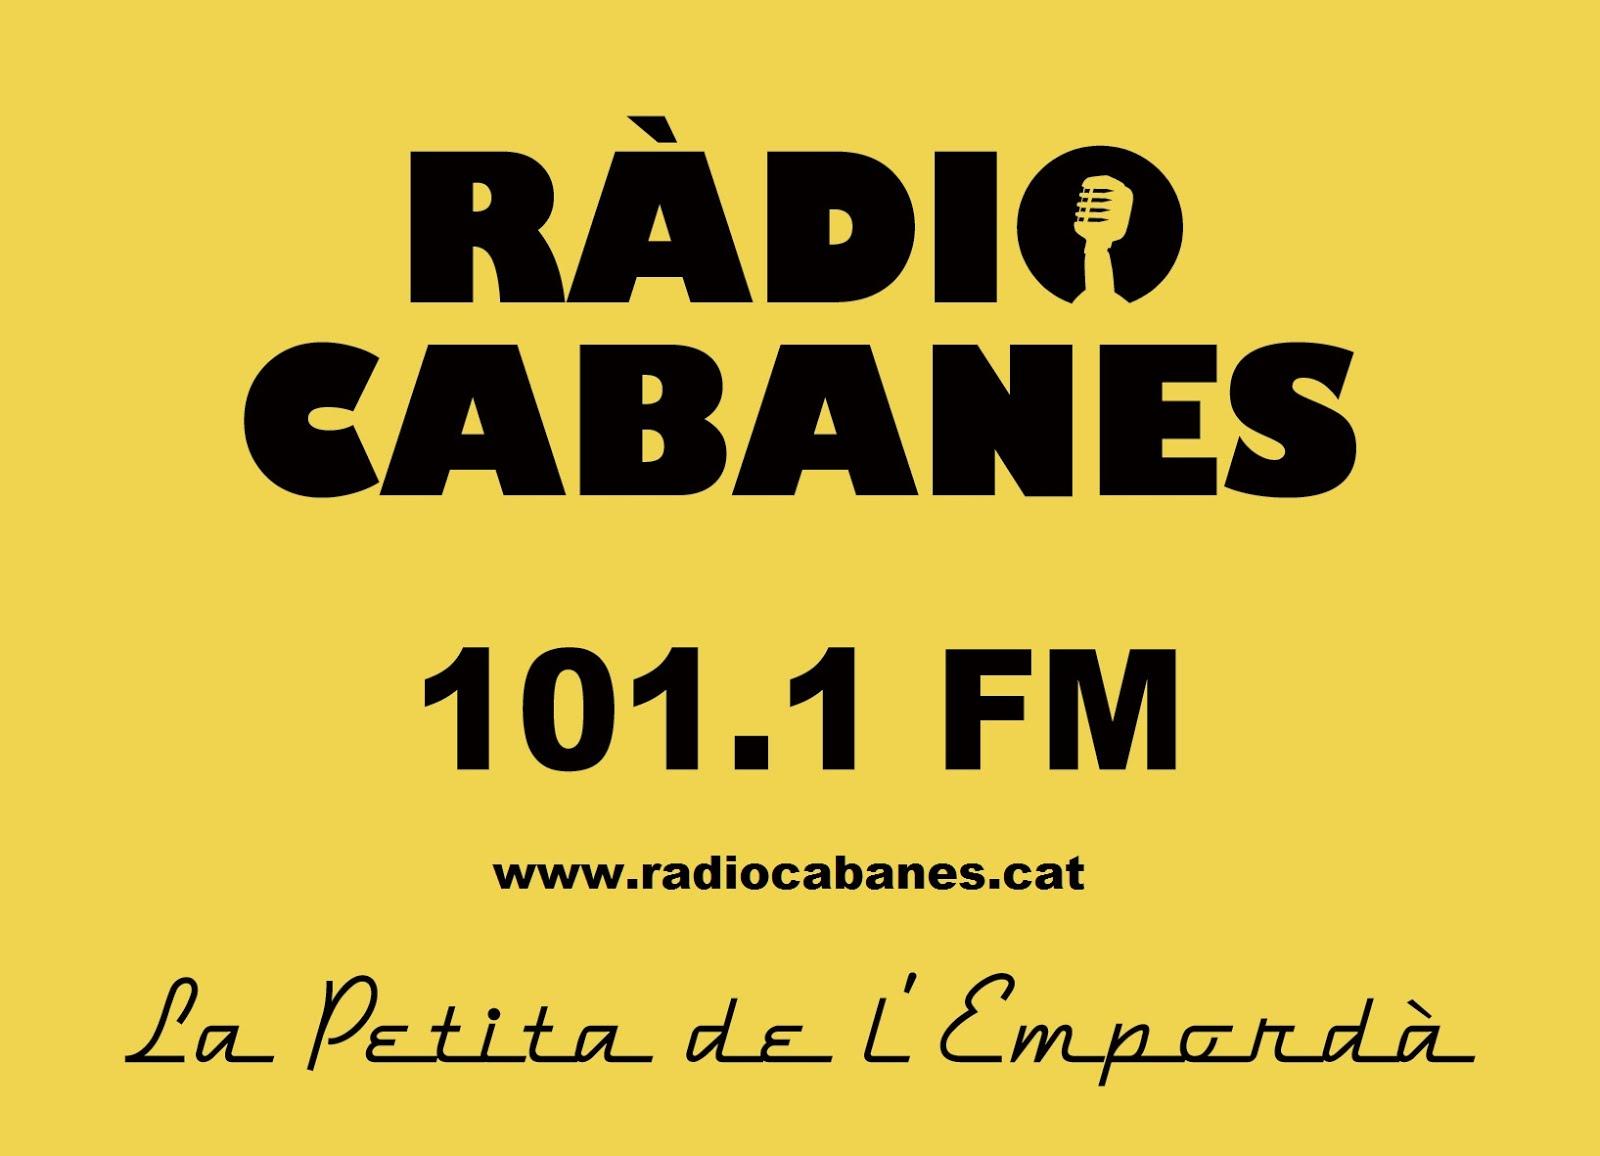 Ràdio Cabanes